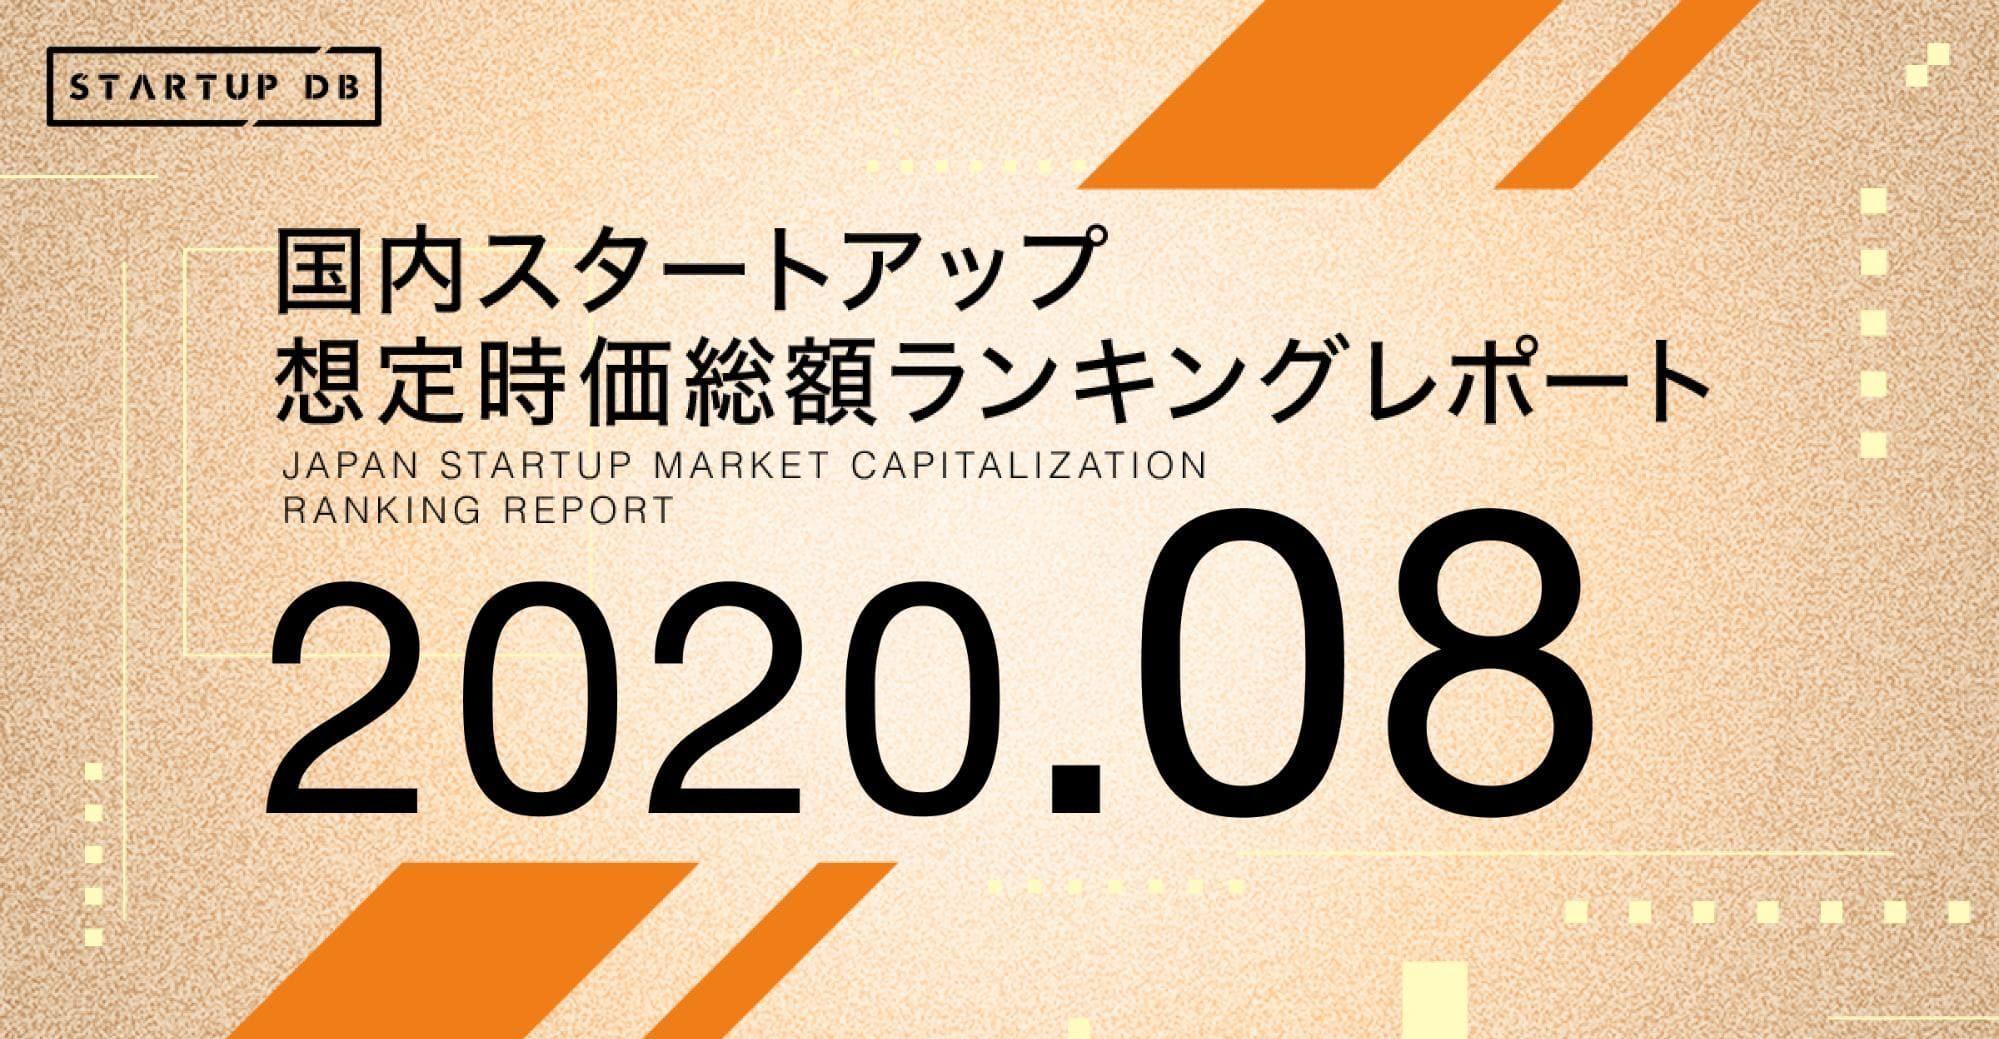 【STARTUP DB】調査結果 国内スタートアップ想定時価総額ランキング(2020年8月)